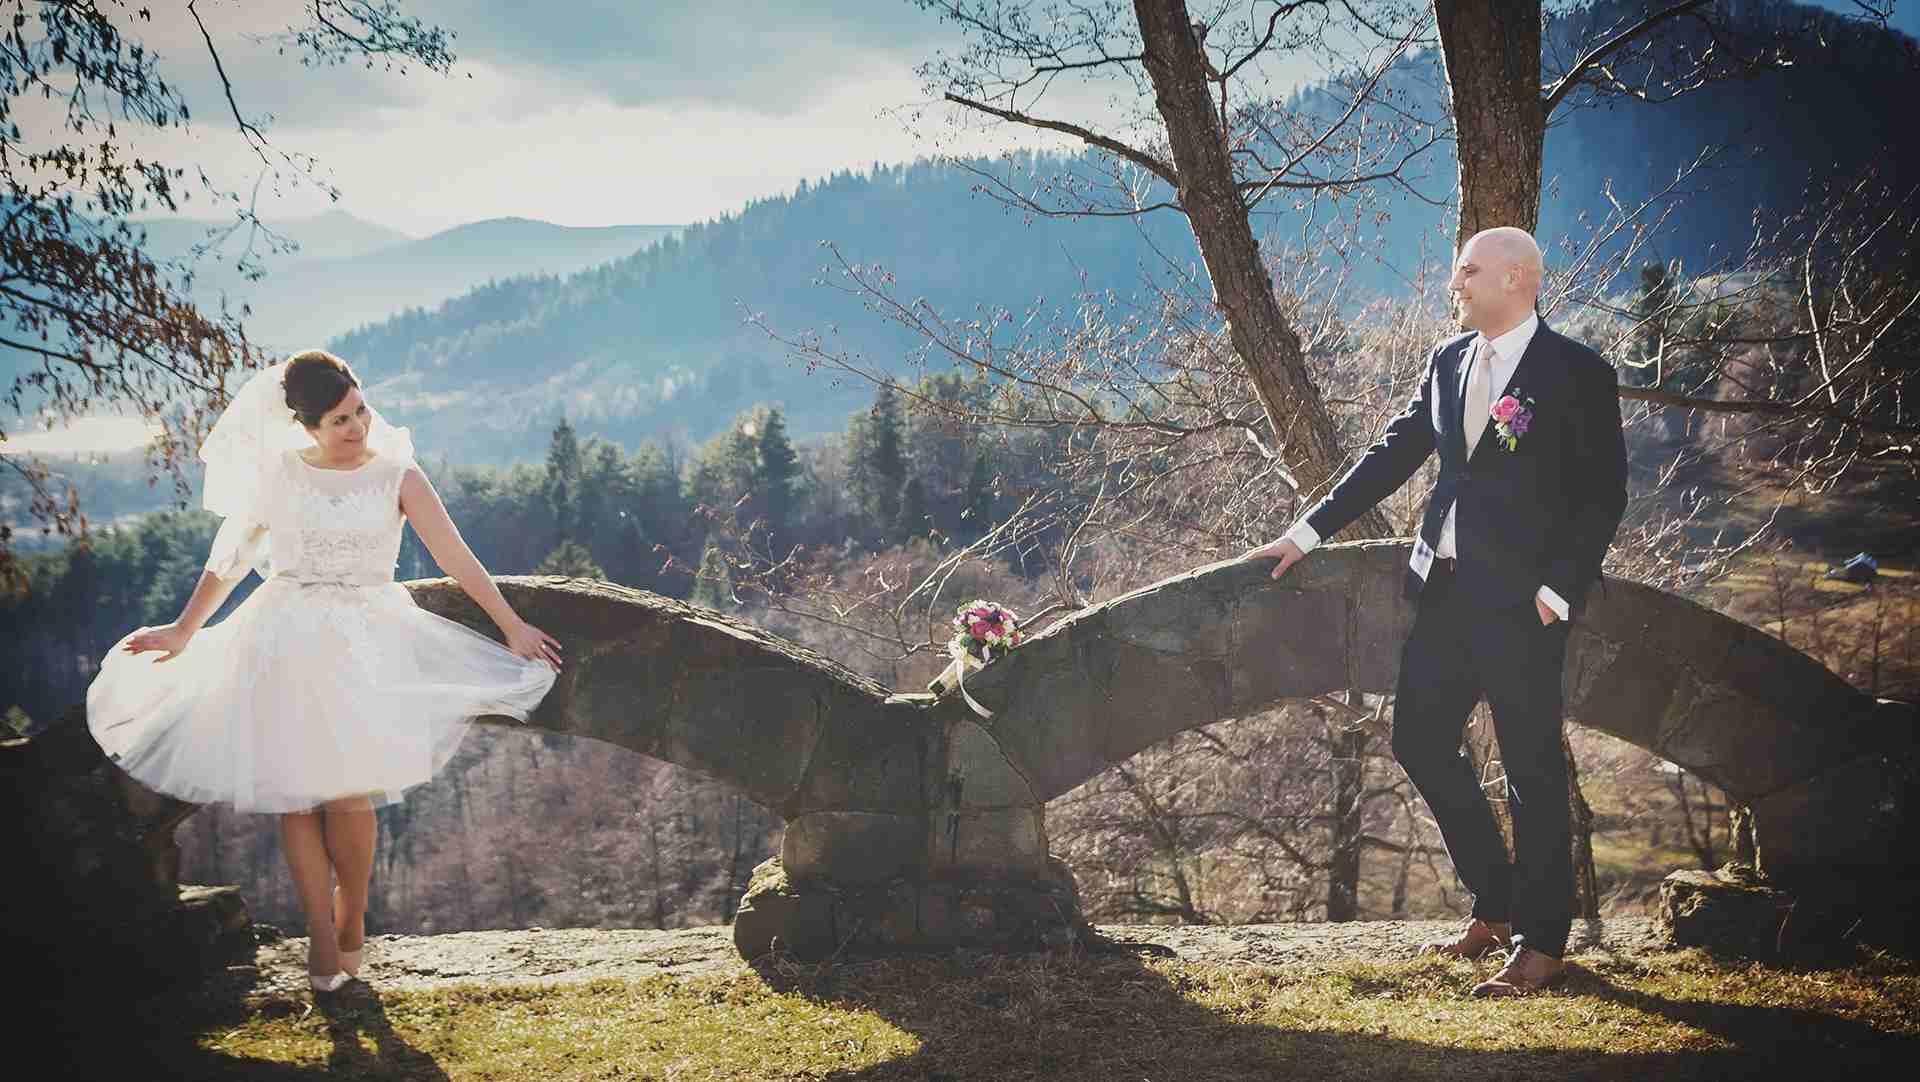 eveniment si nunta fotograf profesionist de Piatra si Targu Neamt, Roman, Bicaz, Bacau, Iasi, Suceava